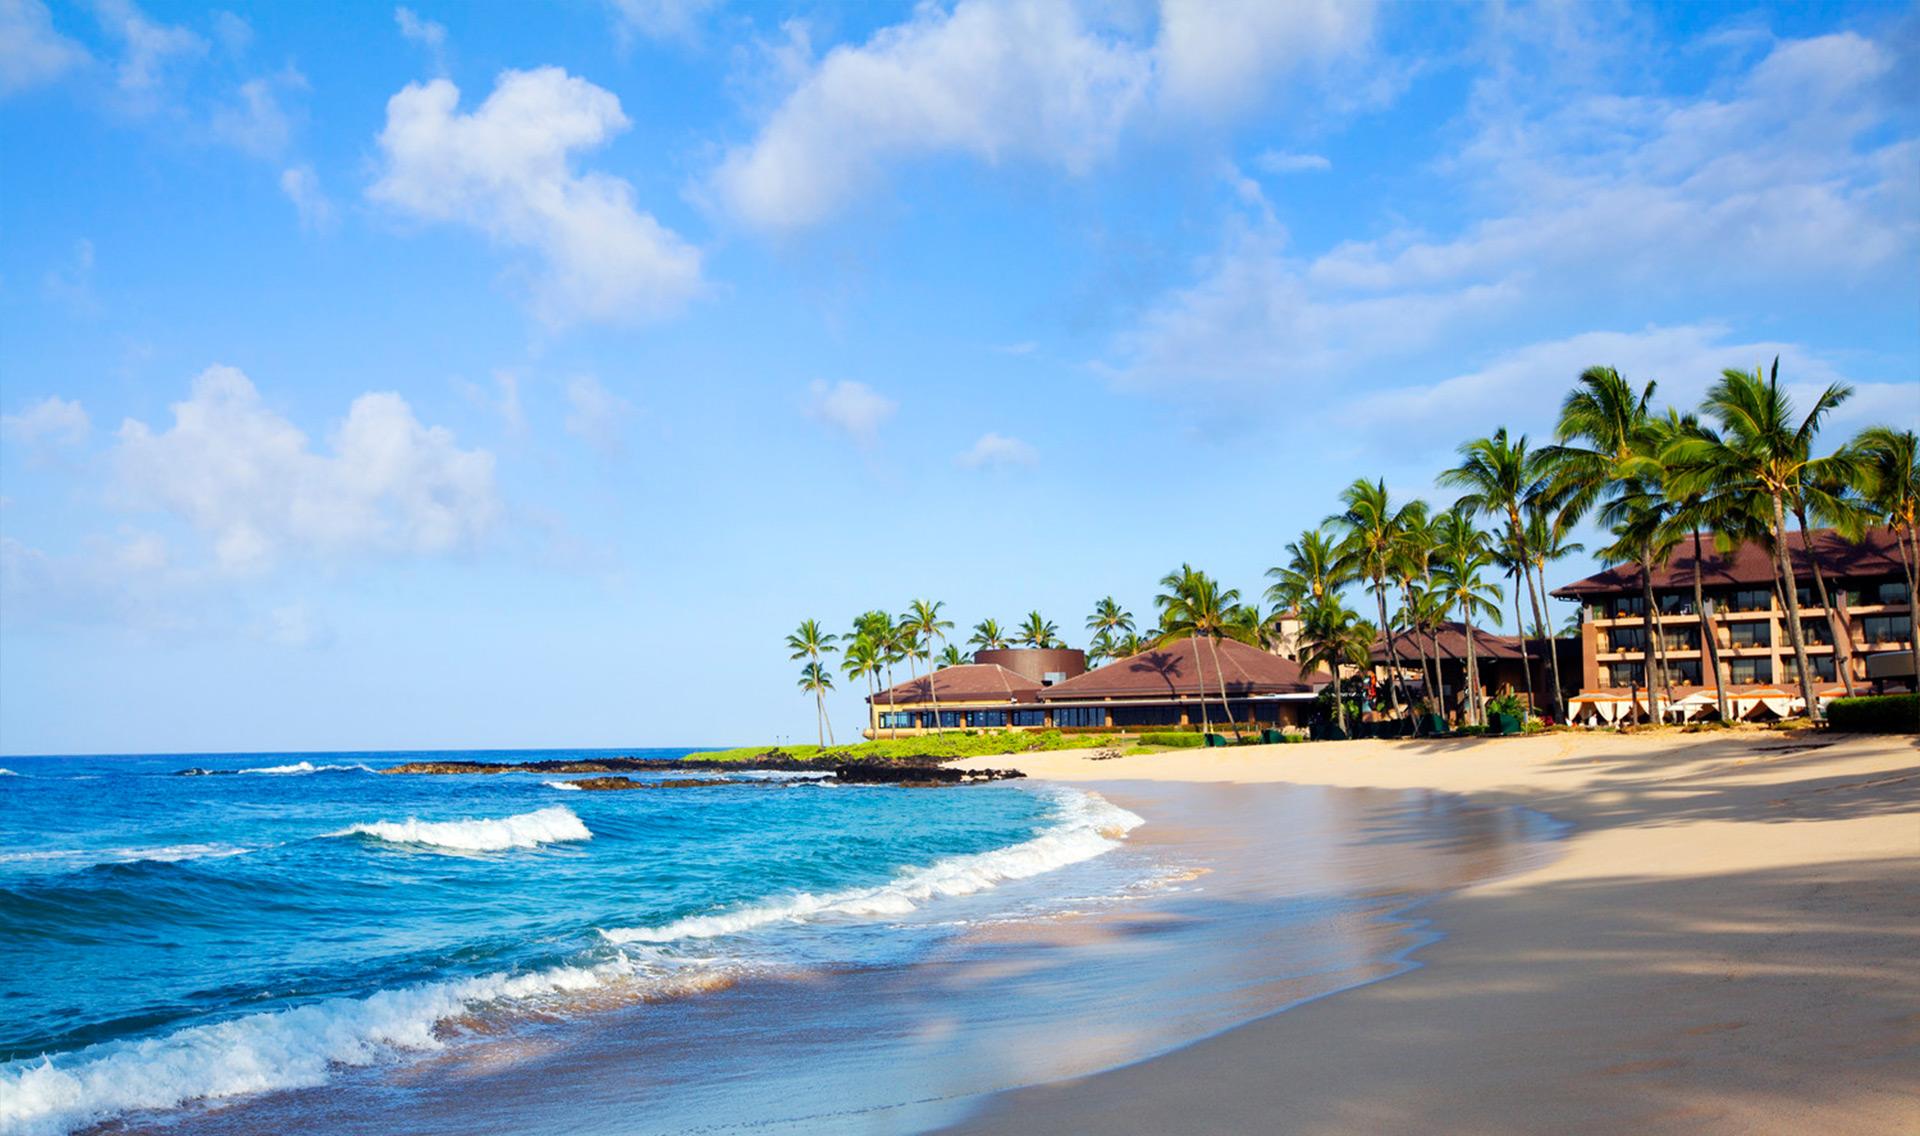 Kauai Beach Hawaii